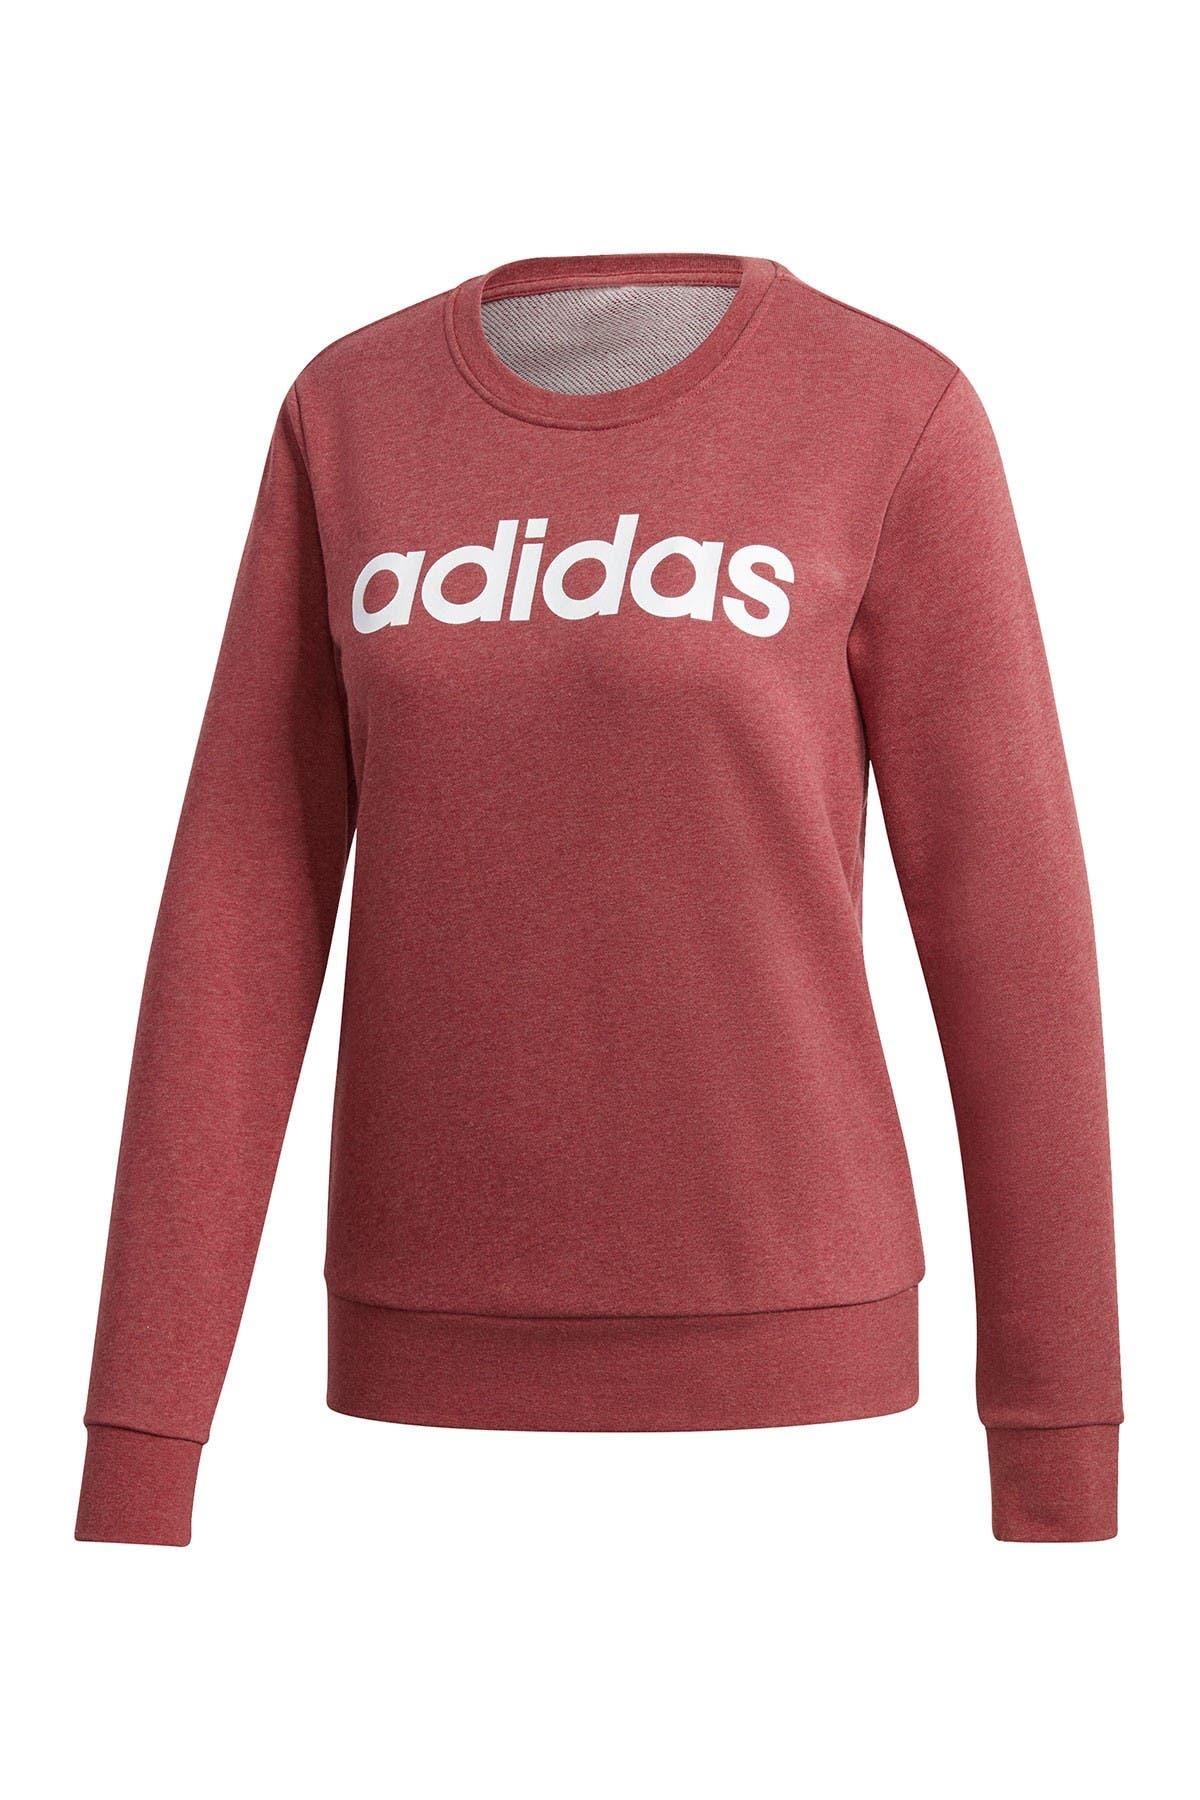 Image of adidas Essentials Linear Sweatshirt